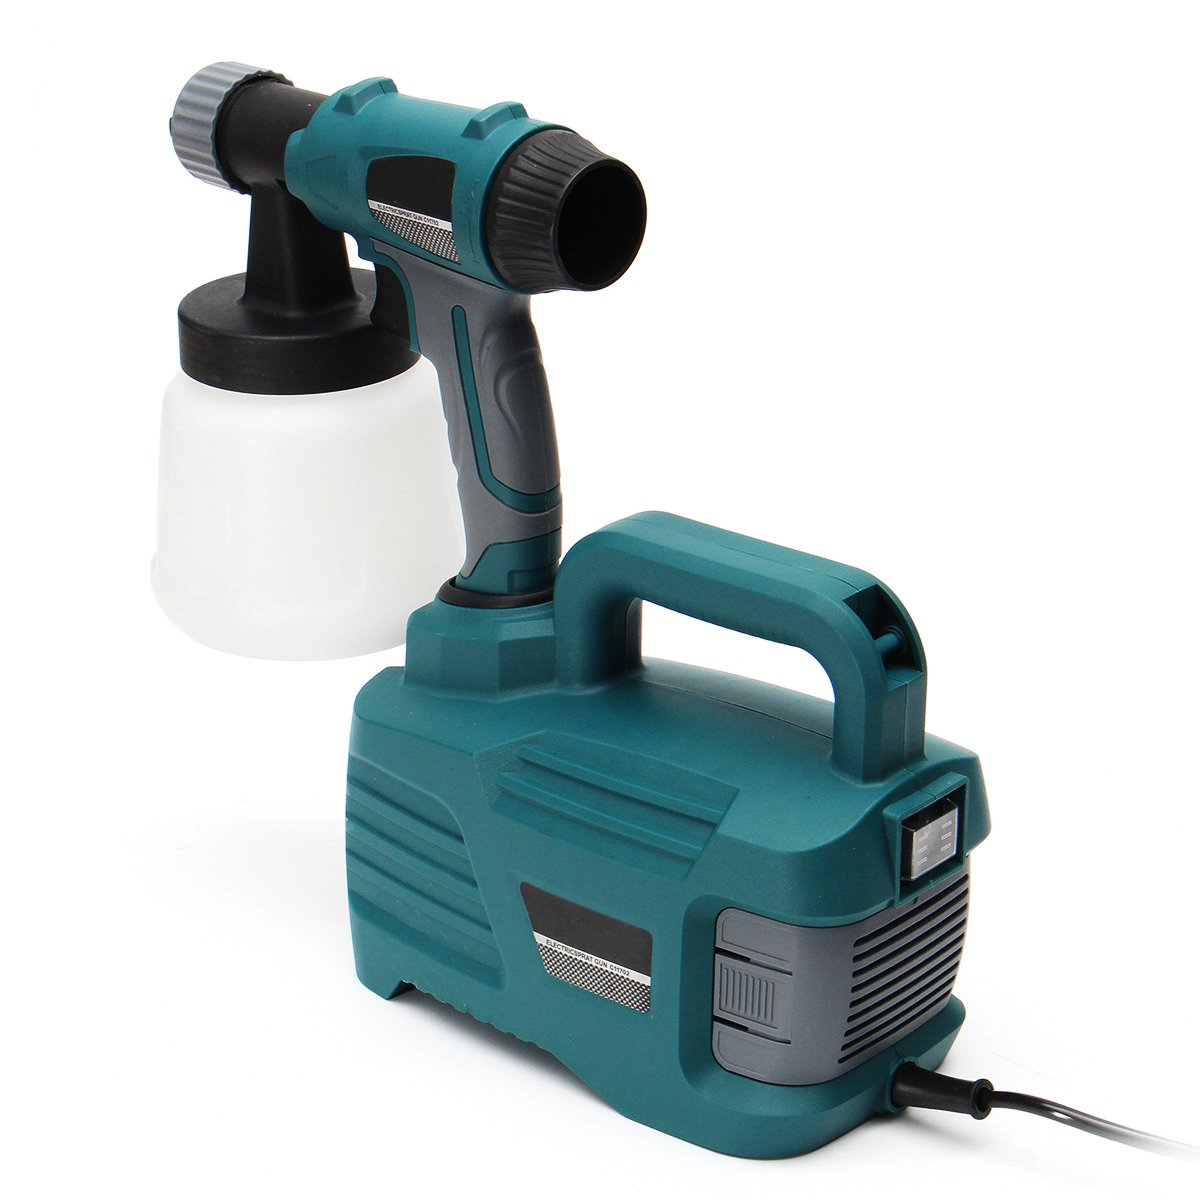 800W 900ML Electric Painter Gun Spray Latex Paint Sprayer House Painting Machine by Ologymart (Image #3)